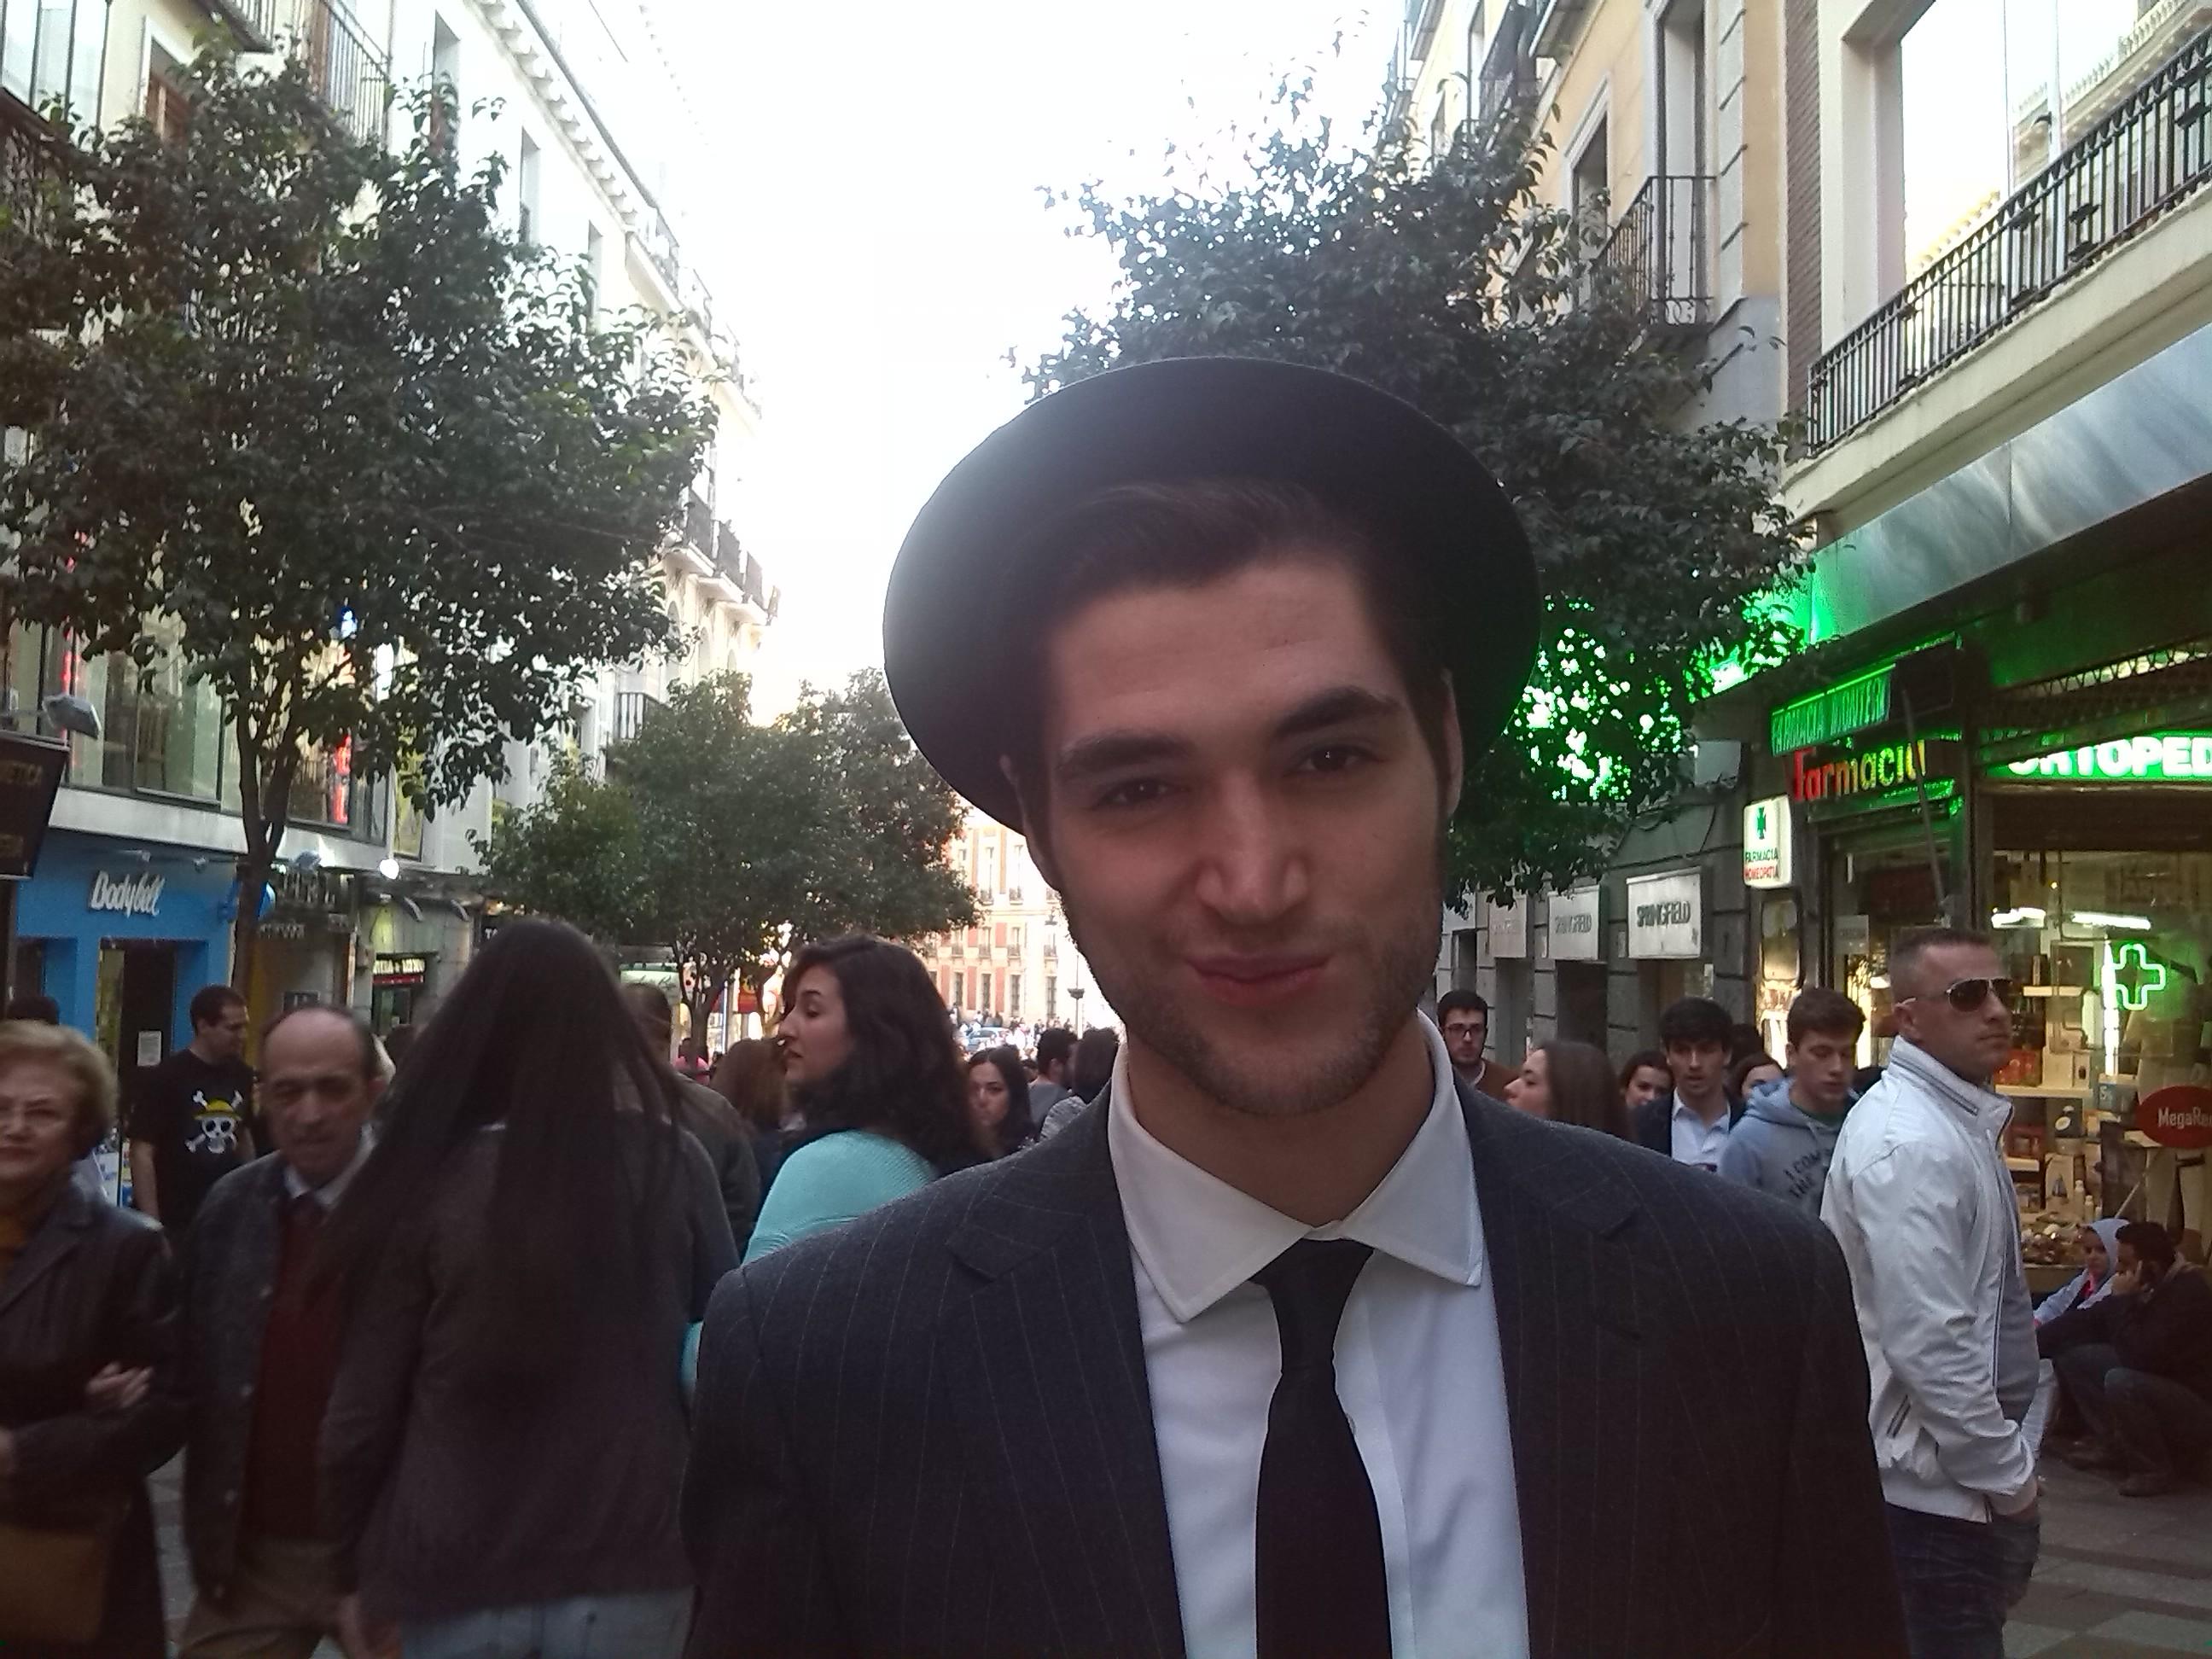 Diego Barrios